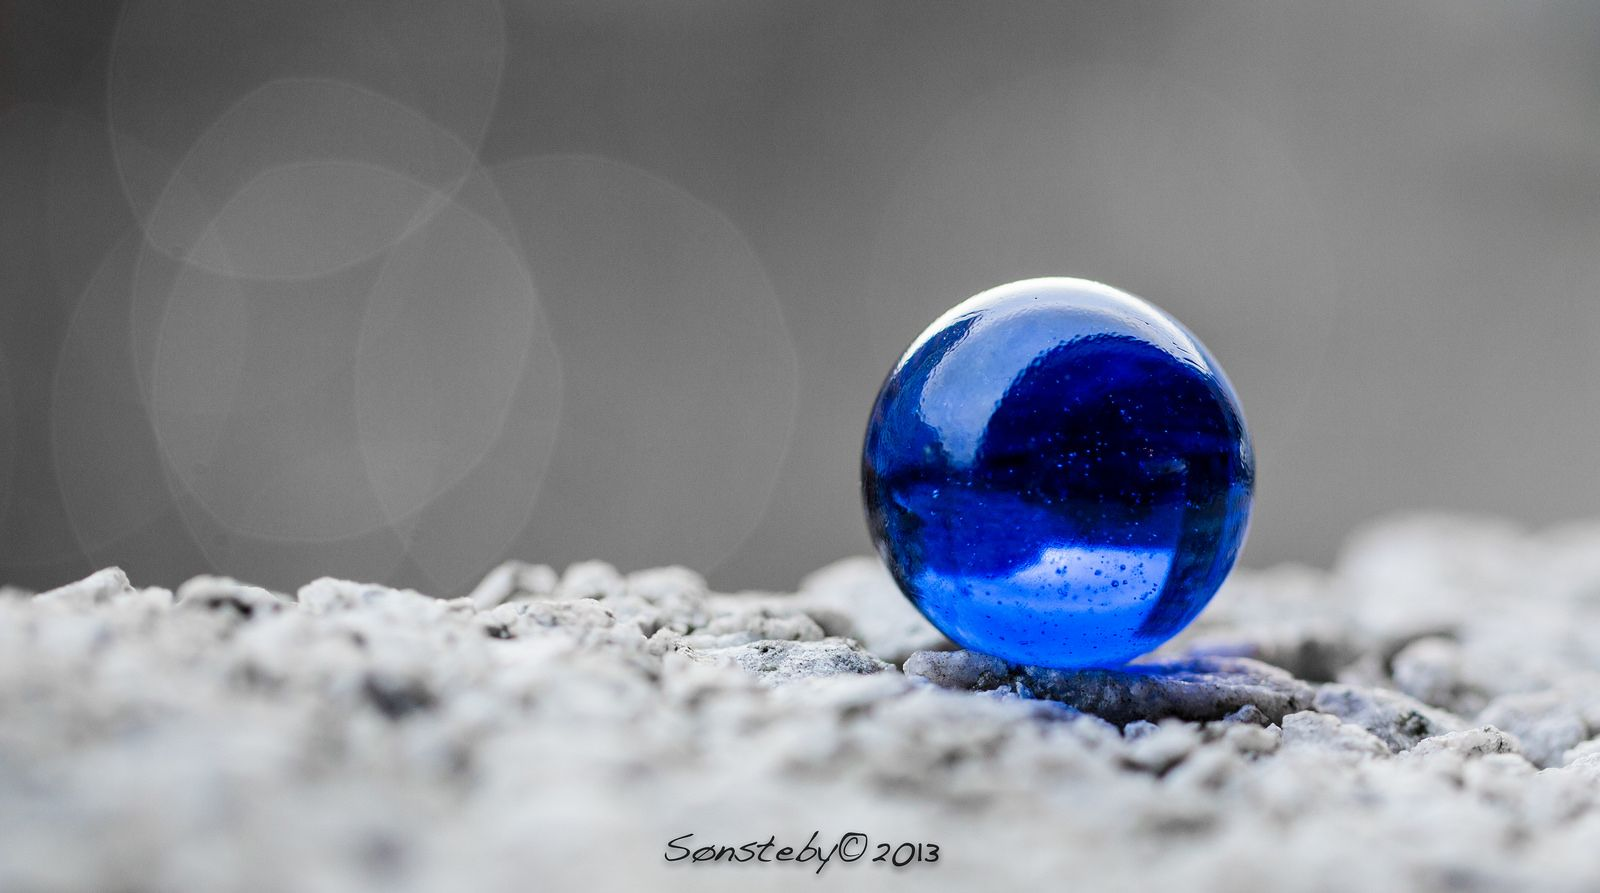 Blue Marble Fotos